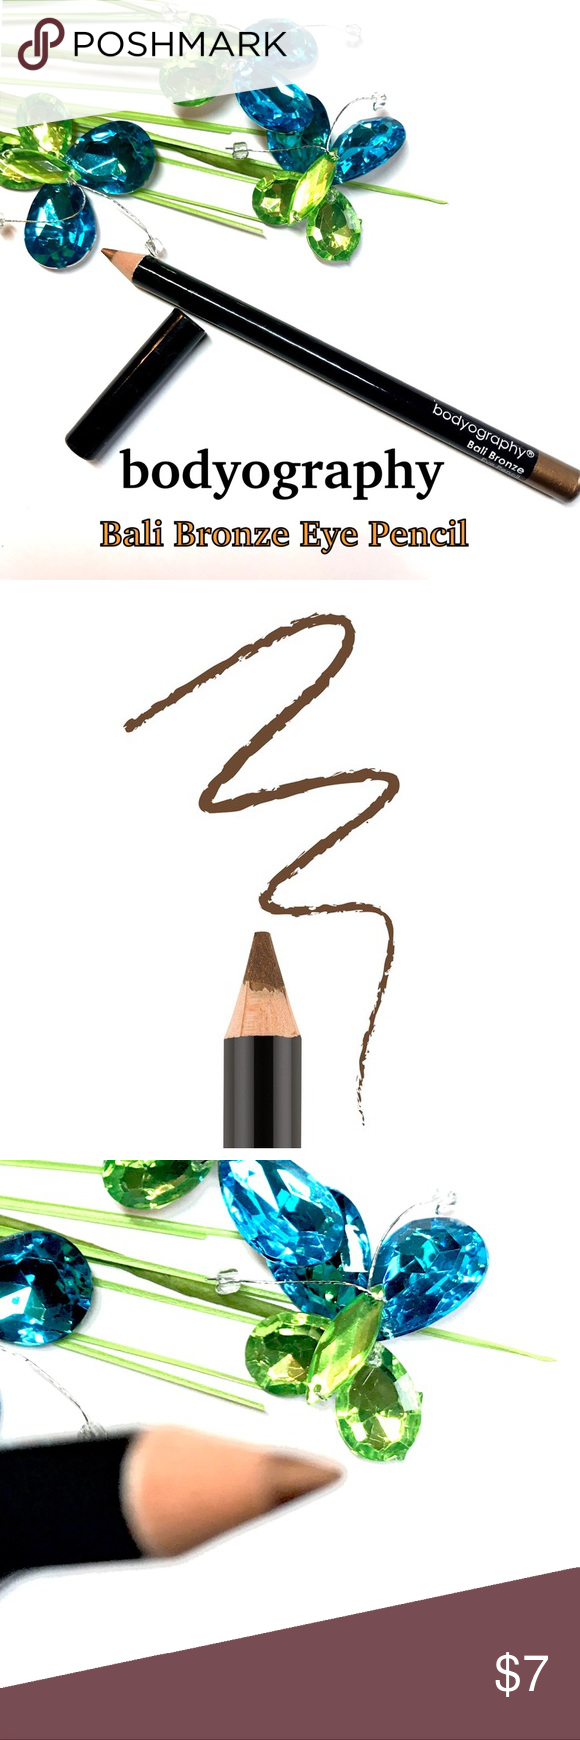 Photo of Brand New!  Bodyography Bali Bronze Eye Pencil Brand New – Never Used Bali Bronz…